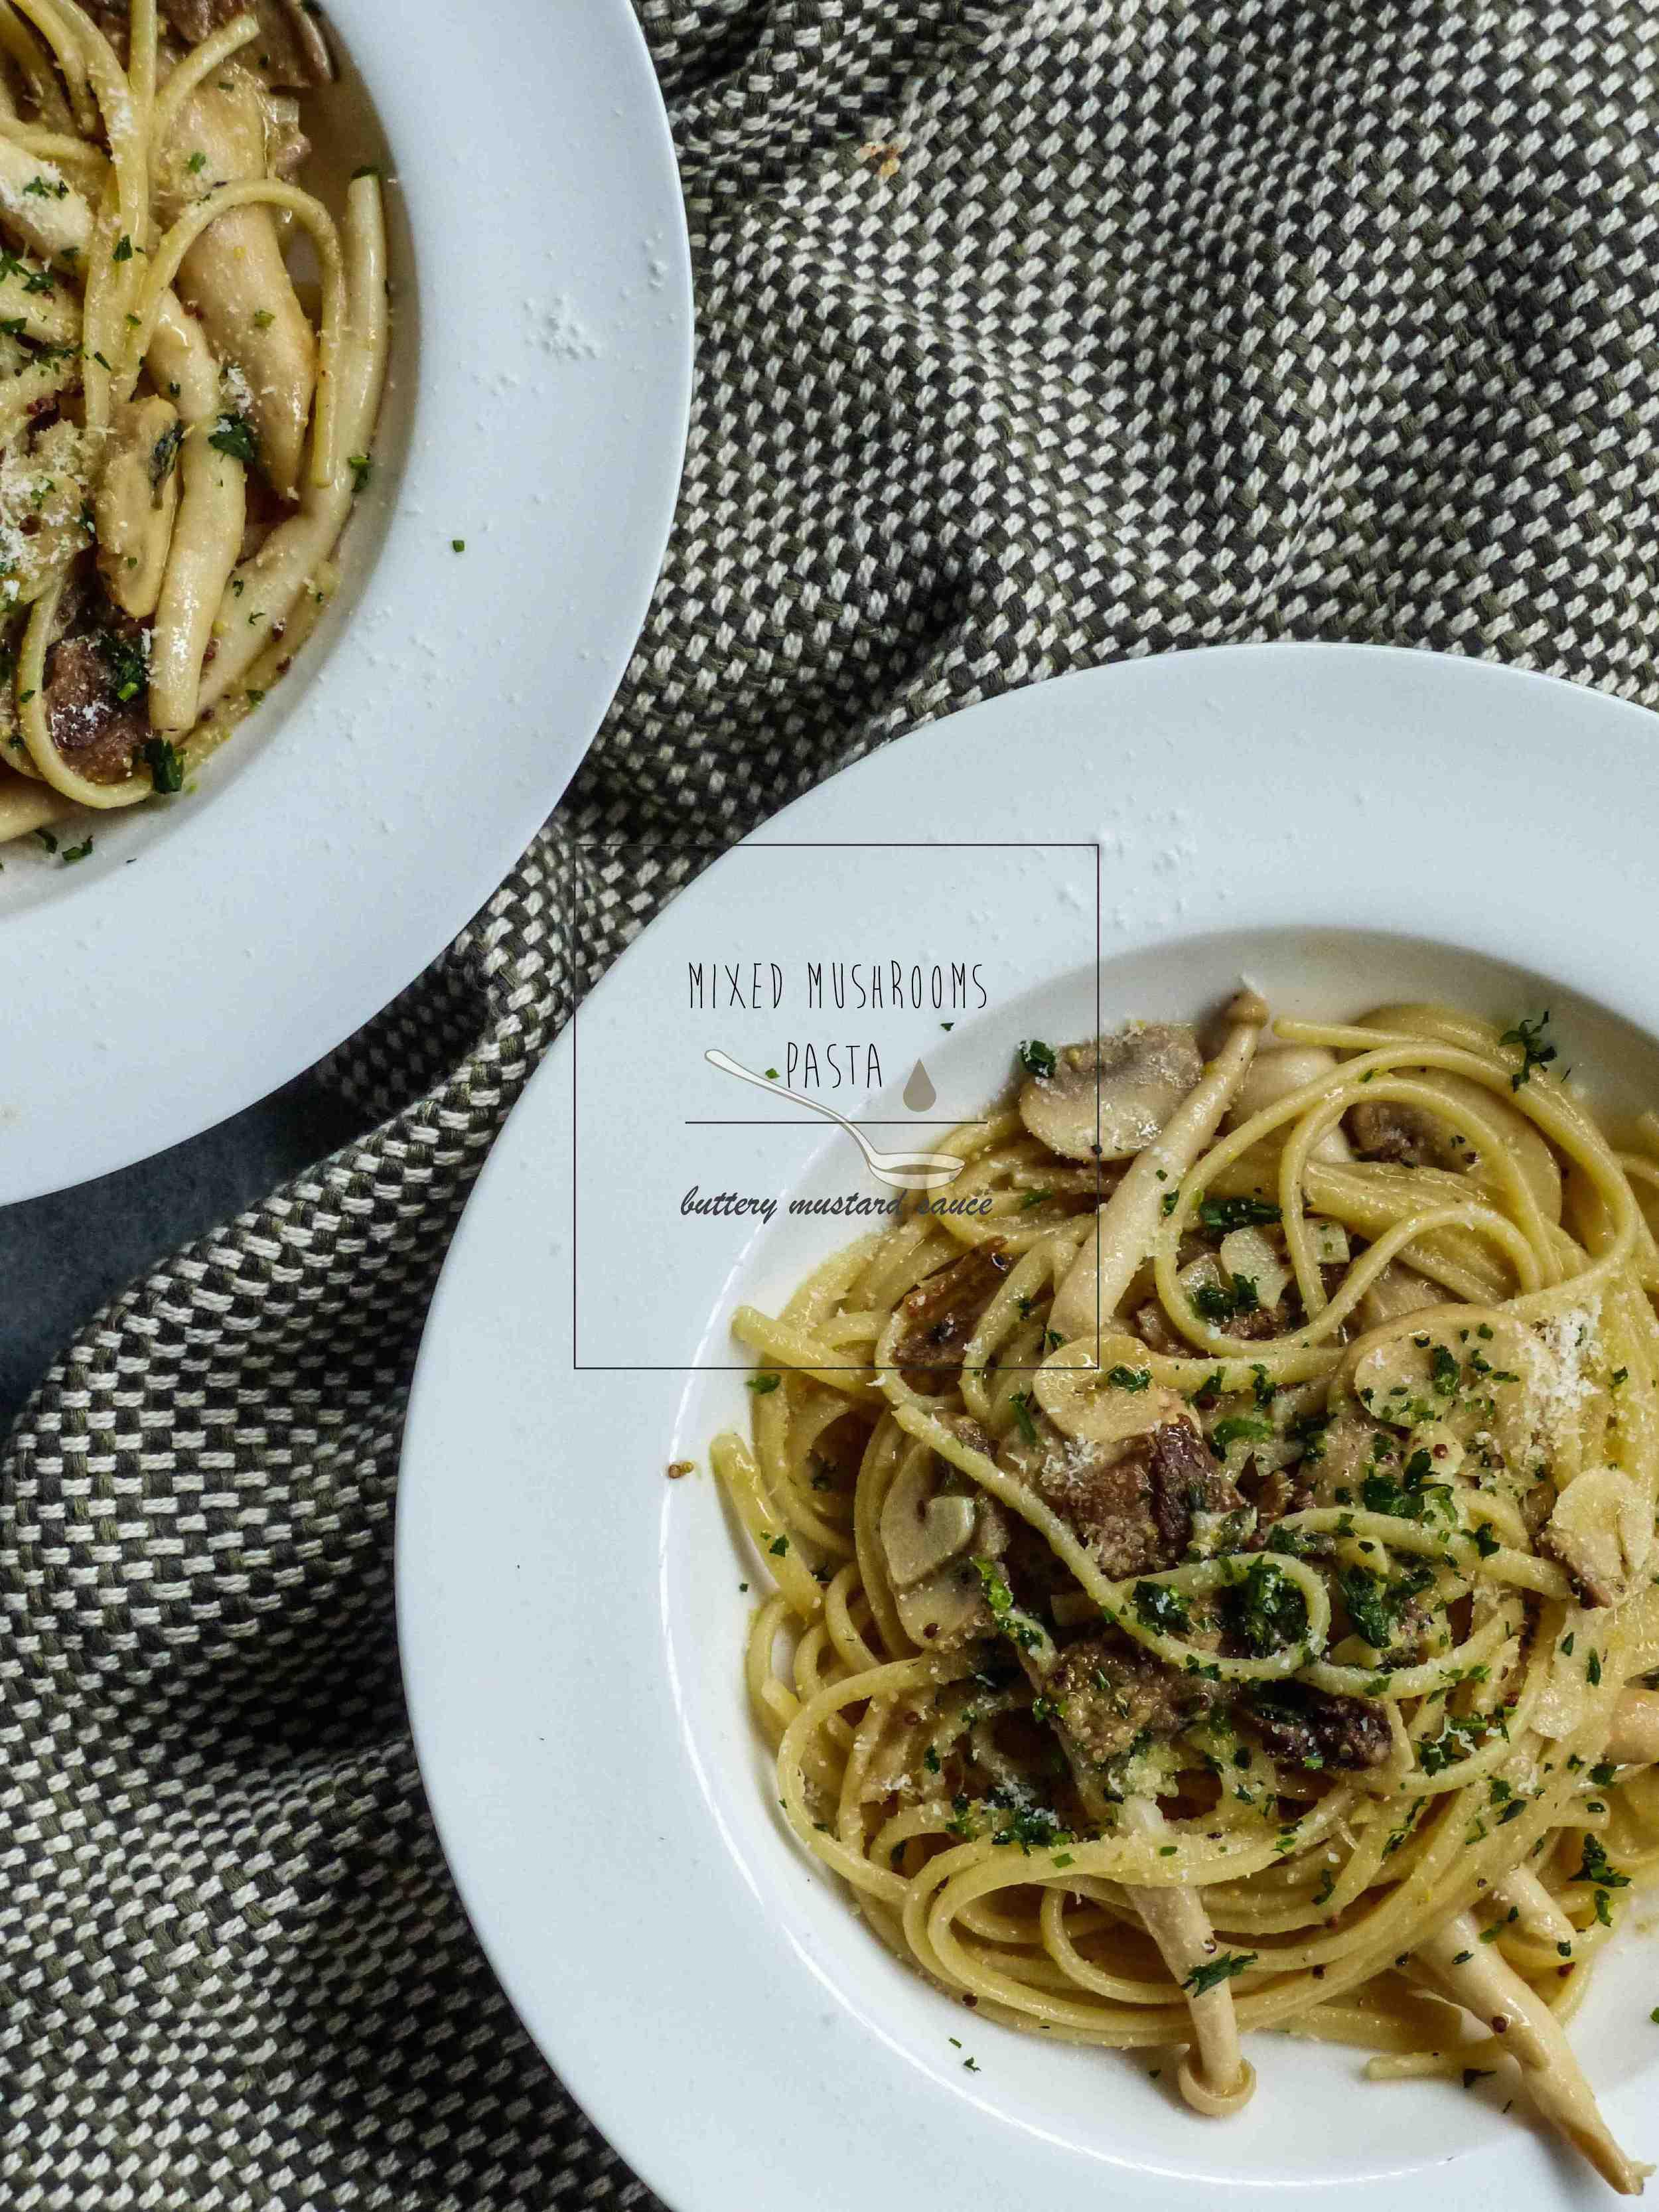 L1060992mixed mushrooms pasta in buttery mustard sauce-1.jpg